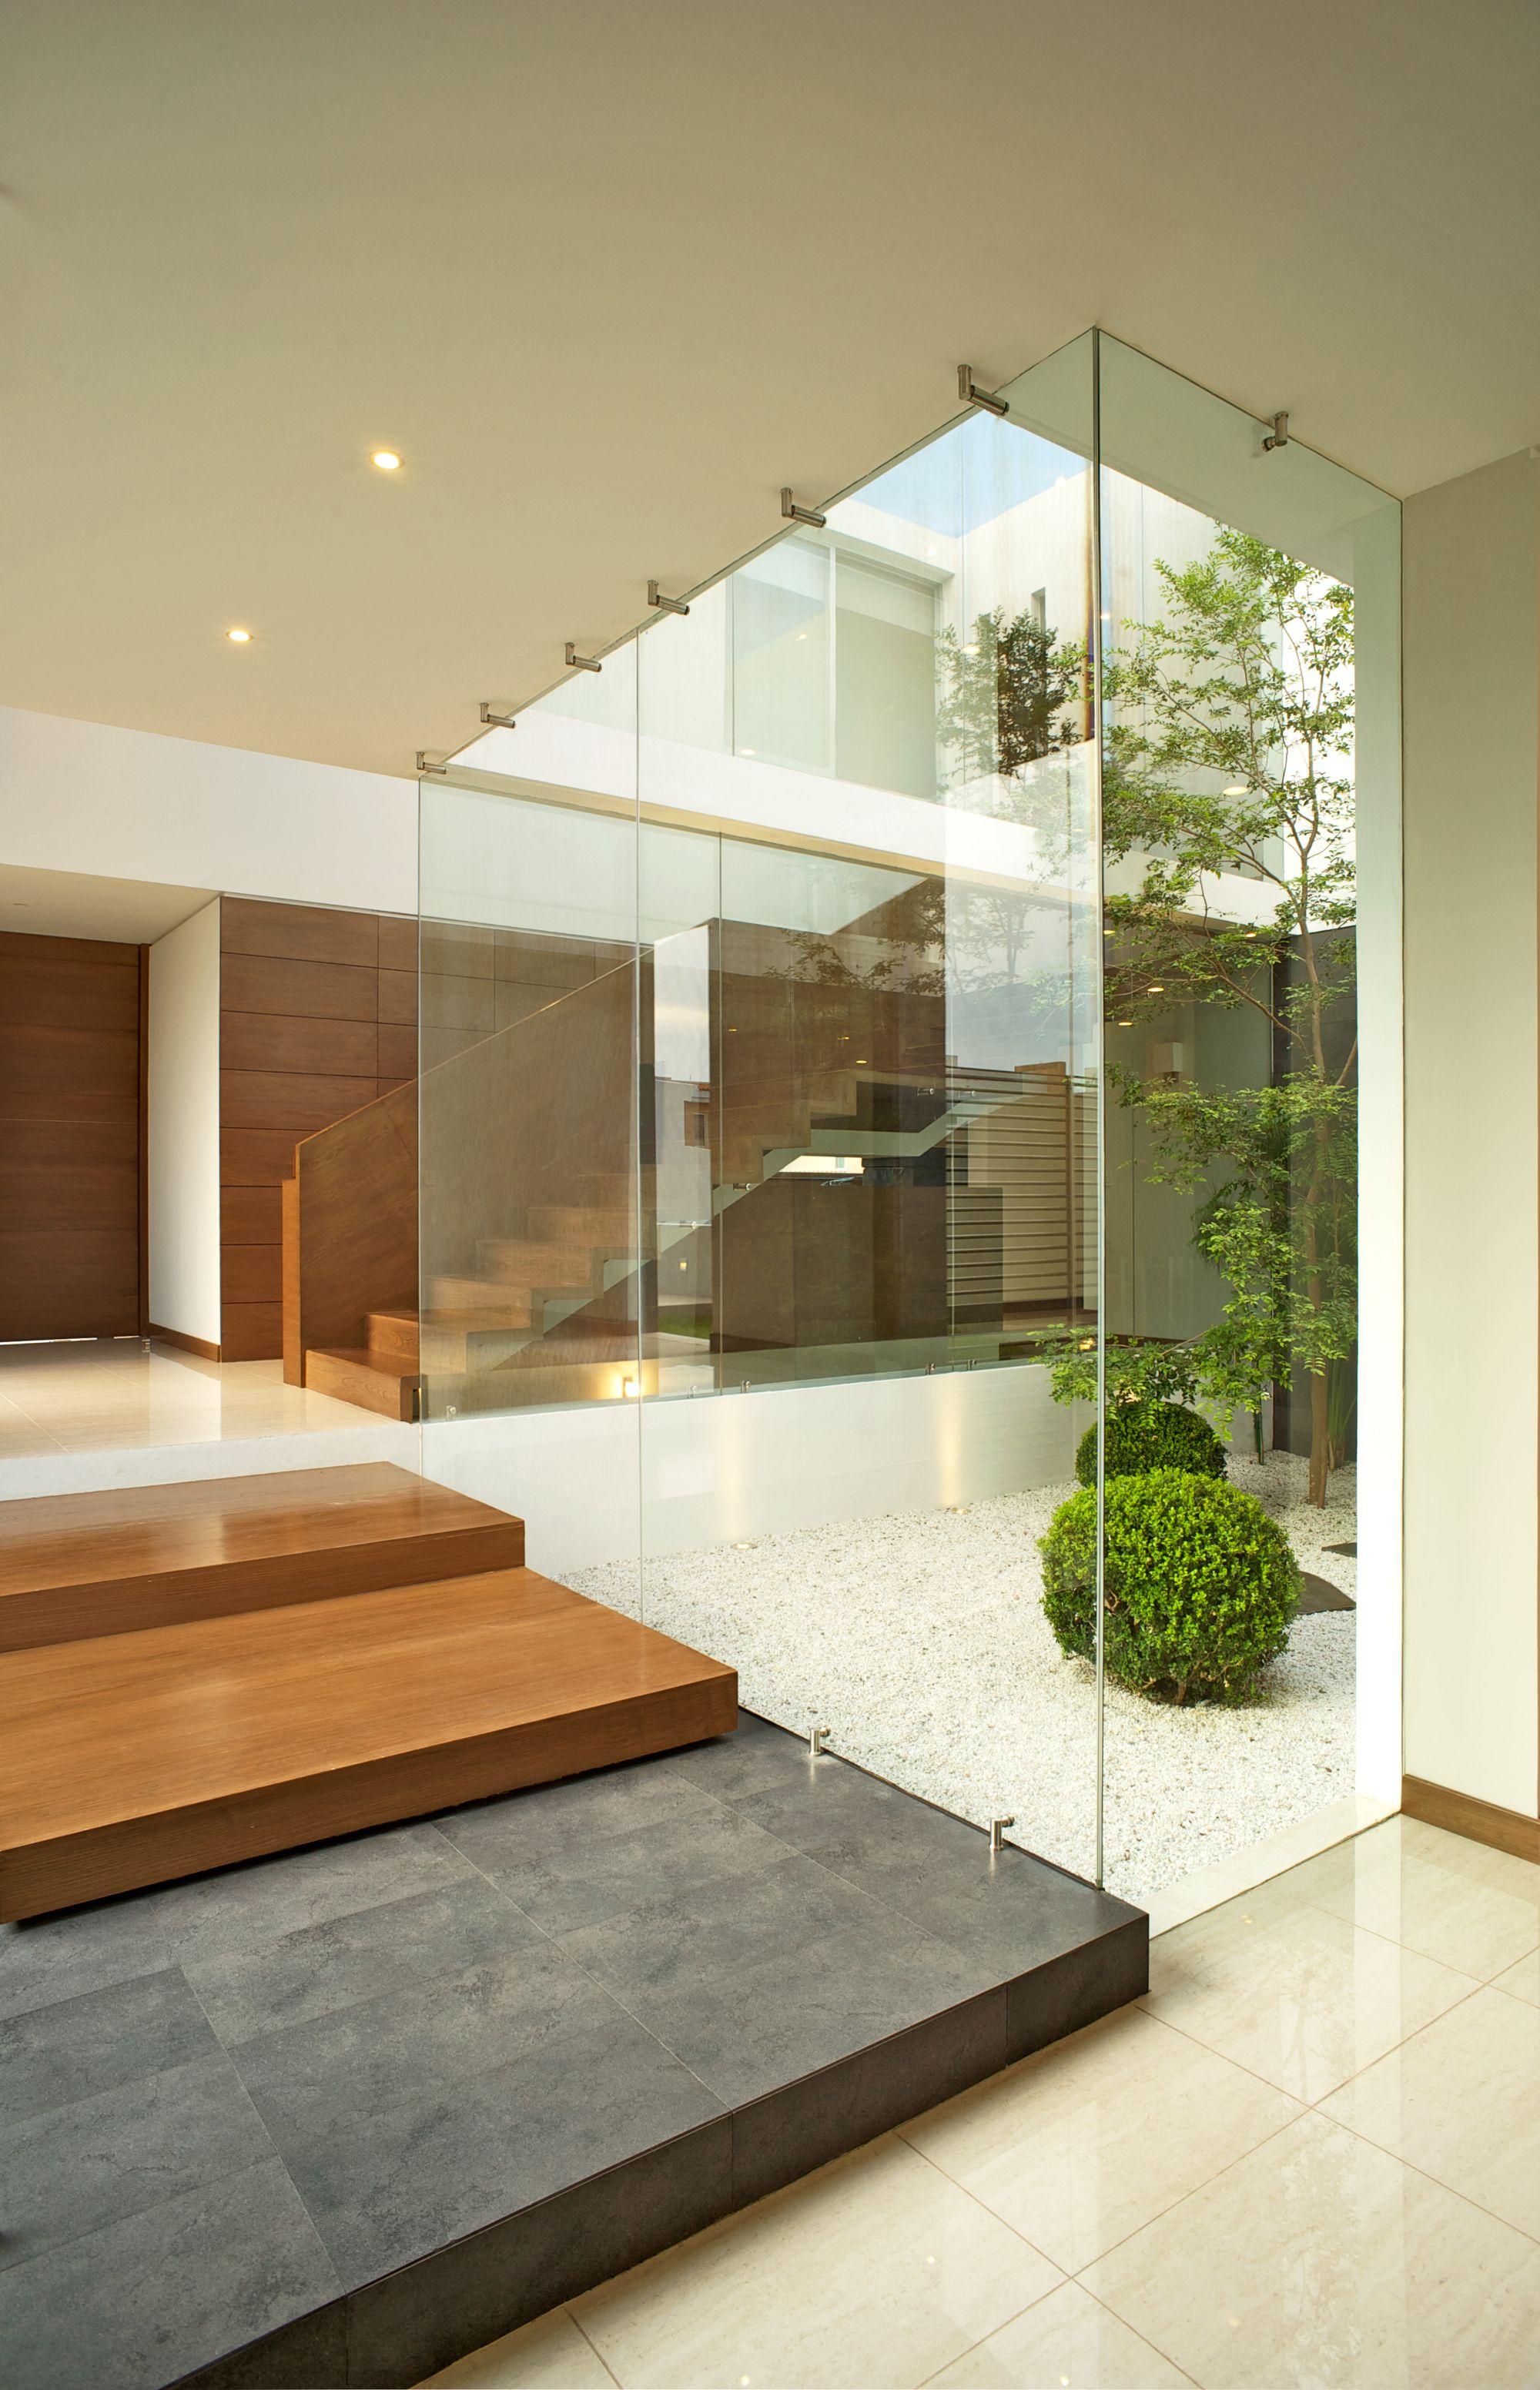 Galeria de casa koz tacher arquitectos interiors